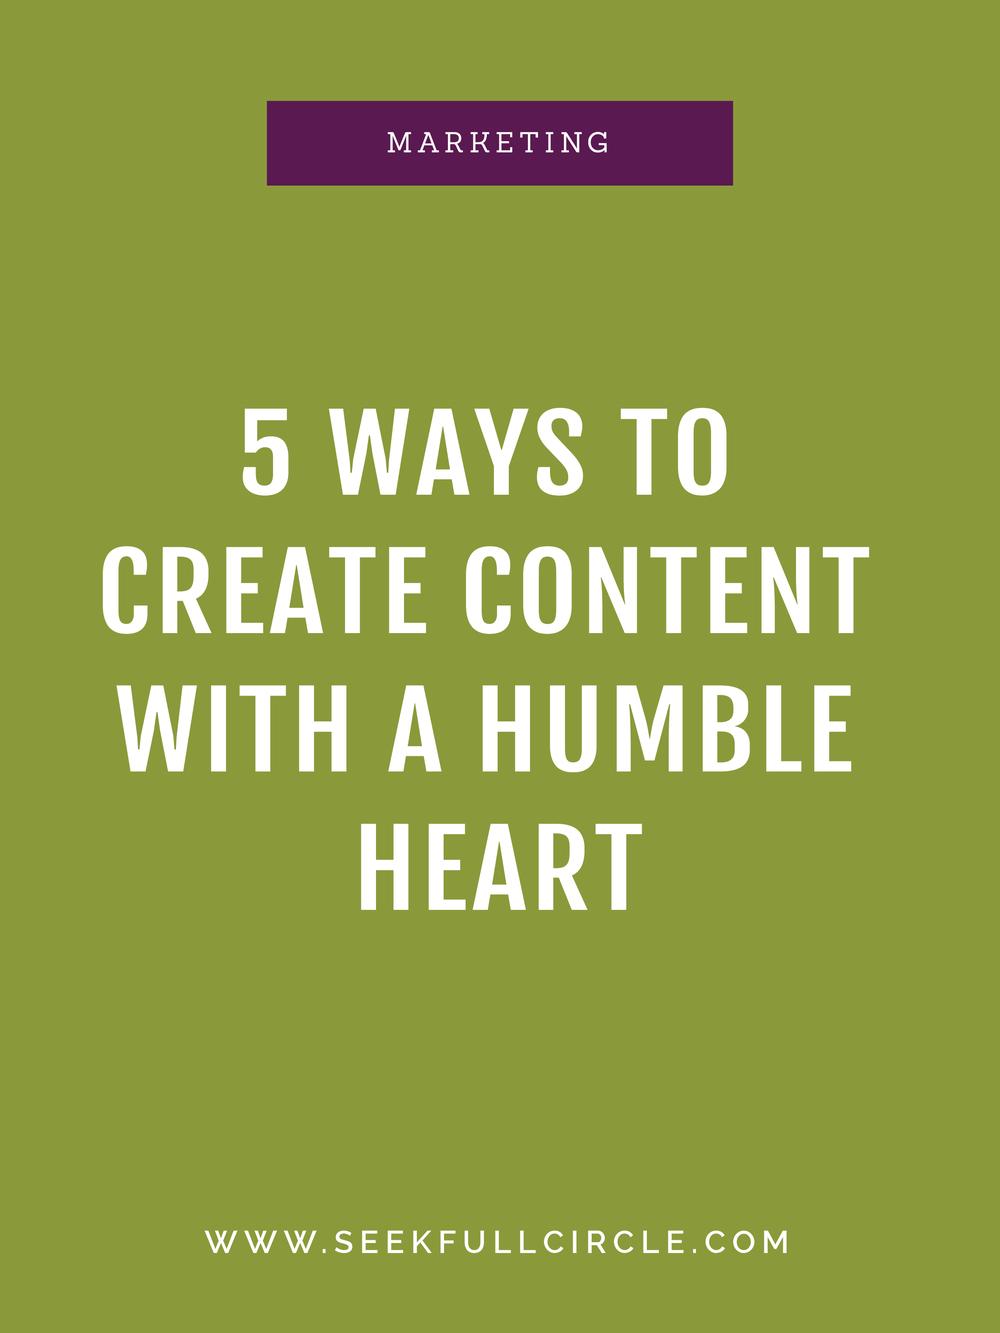 kim waltman fullcircle creative + coaching create content with humble heart blog